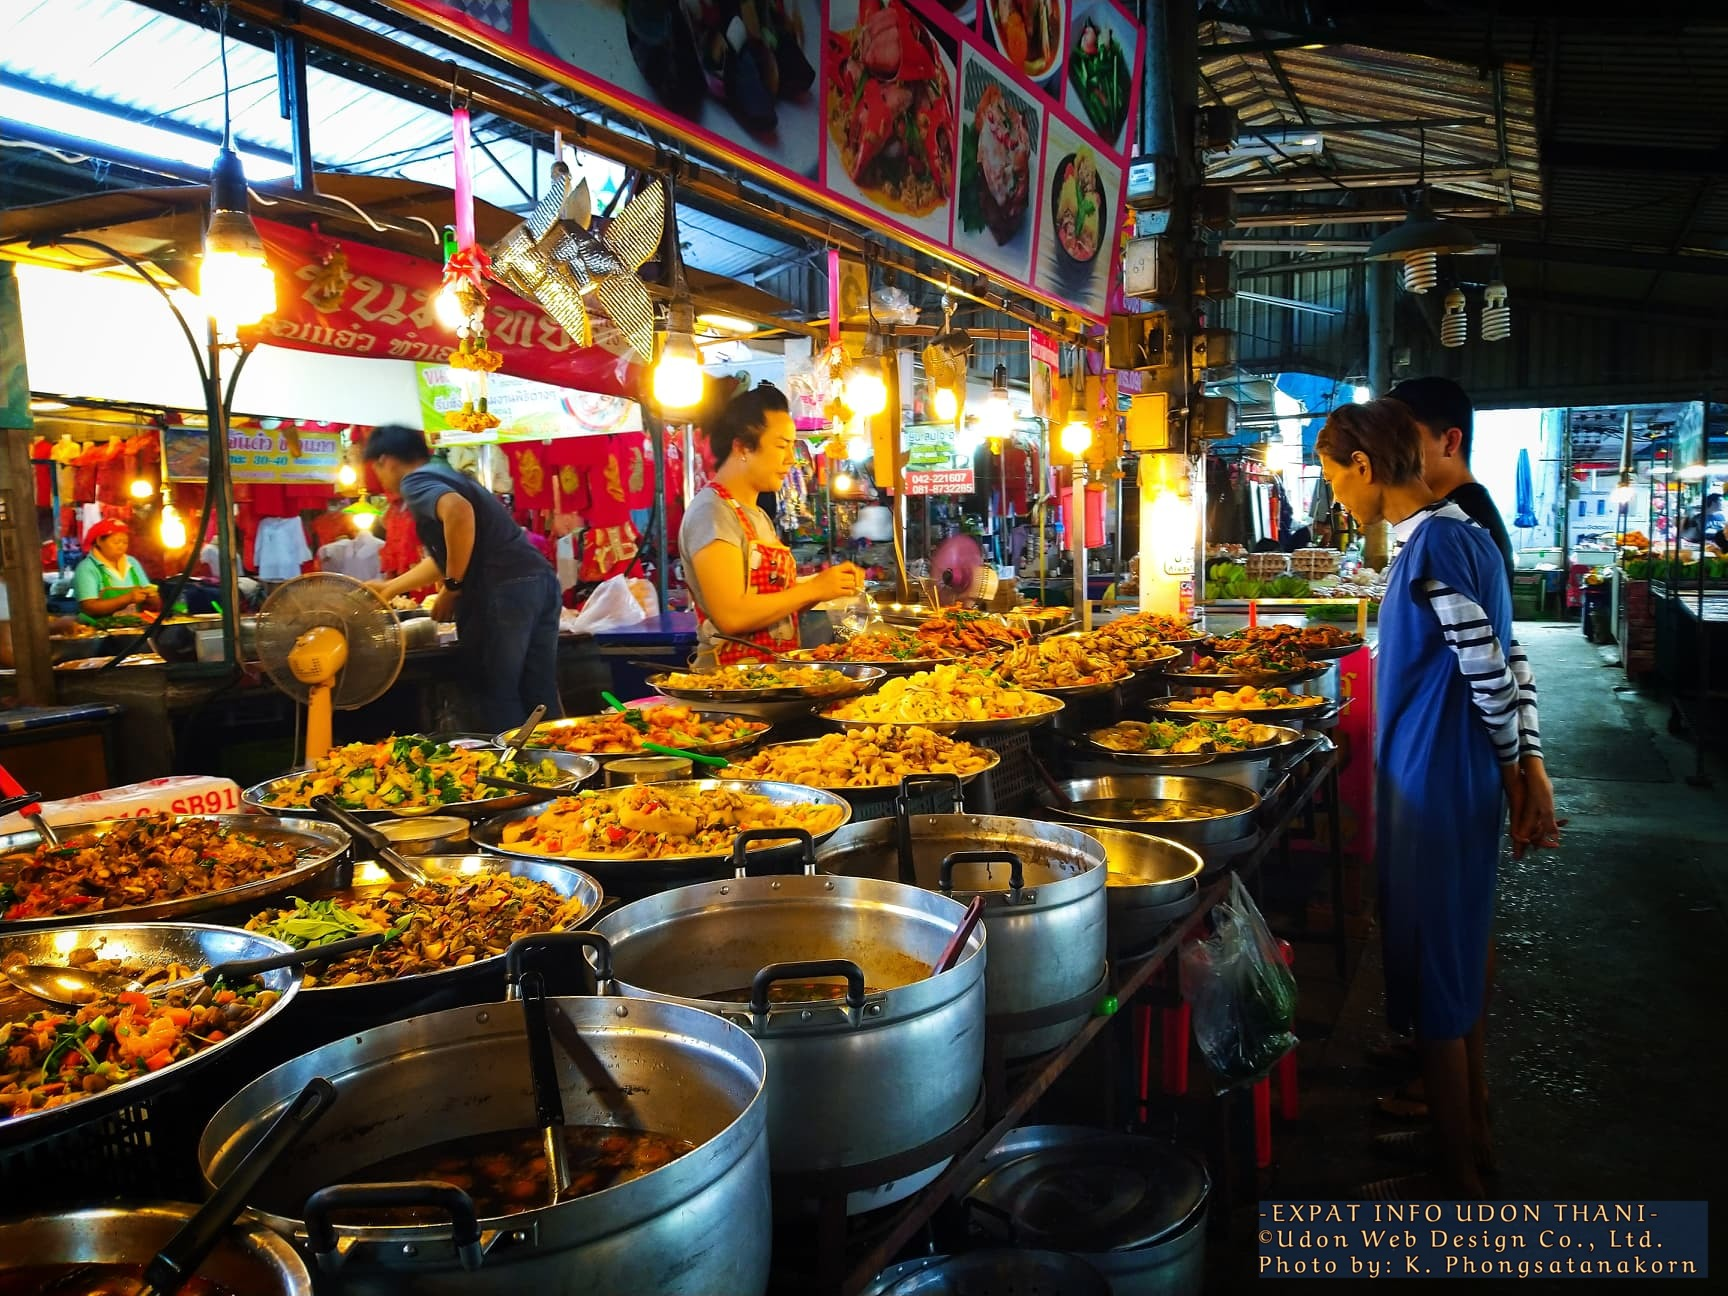 Ban Huay Market Food Stall, Udon Thani Thailand